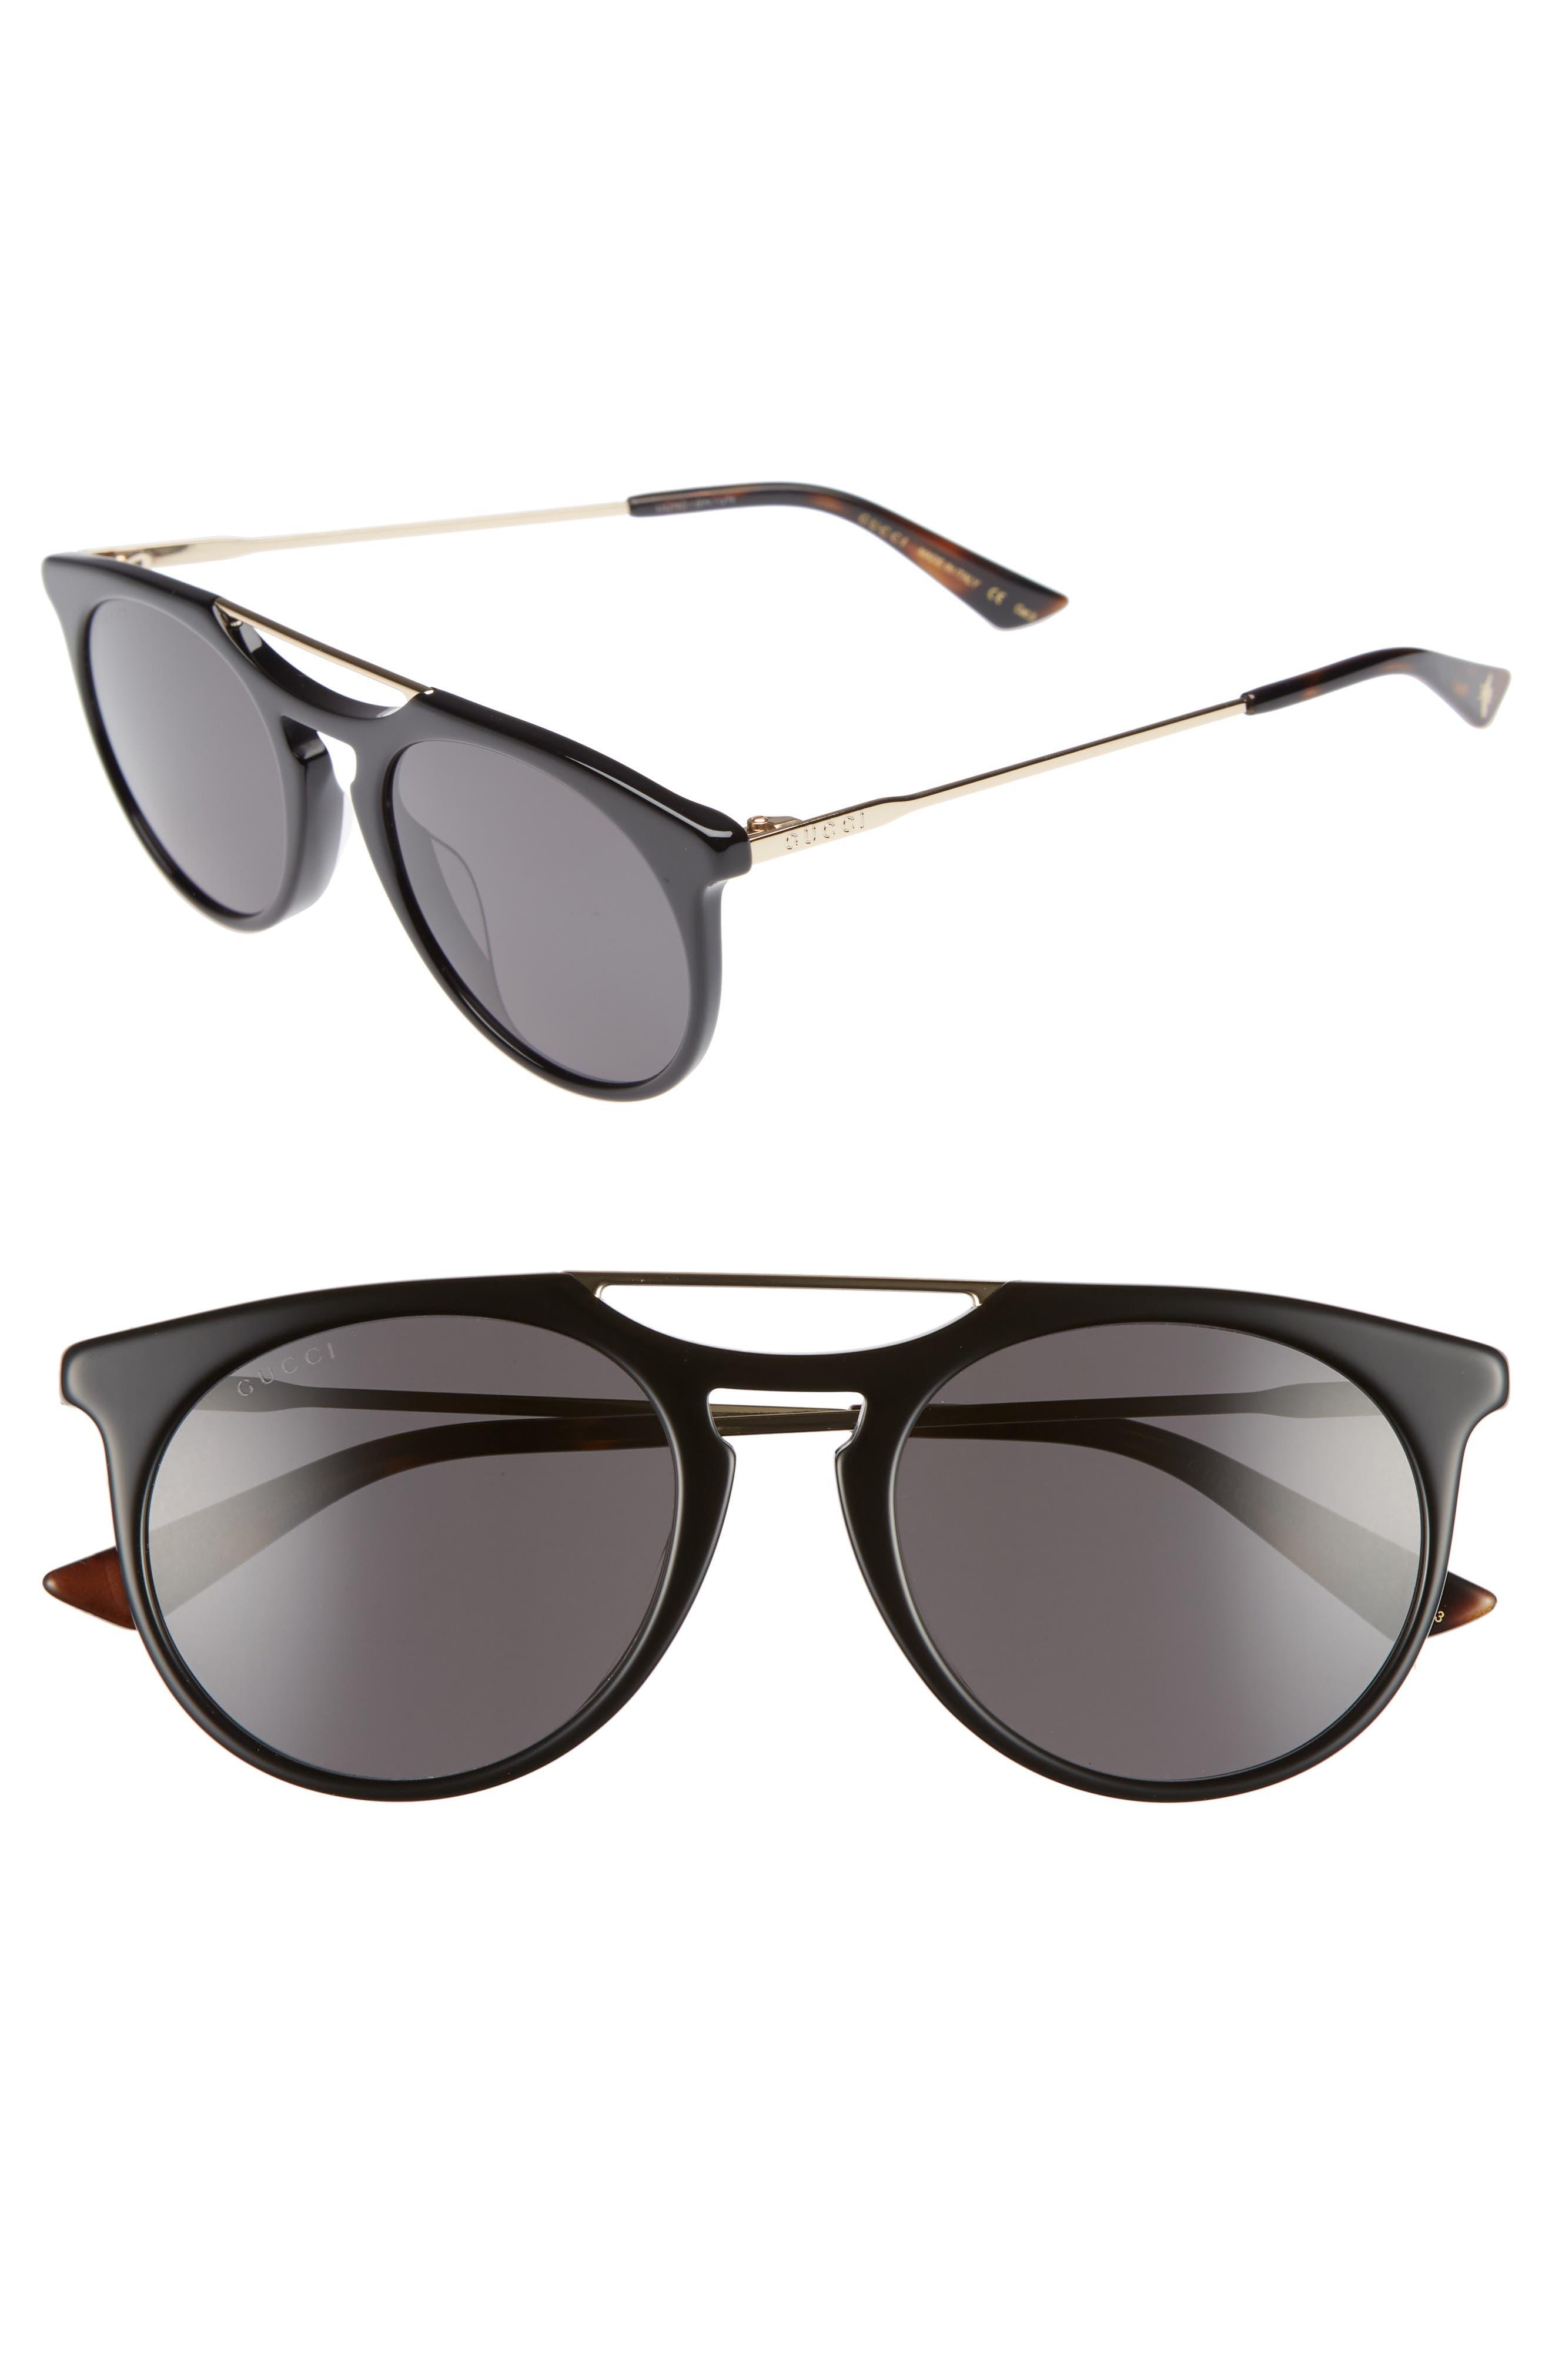 e438c2b46d Gucci Light Combi 5m Sunglasses - Gold  Dark Havana